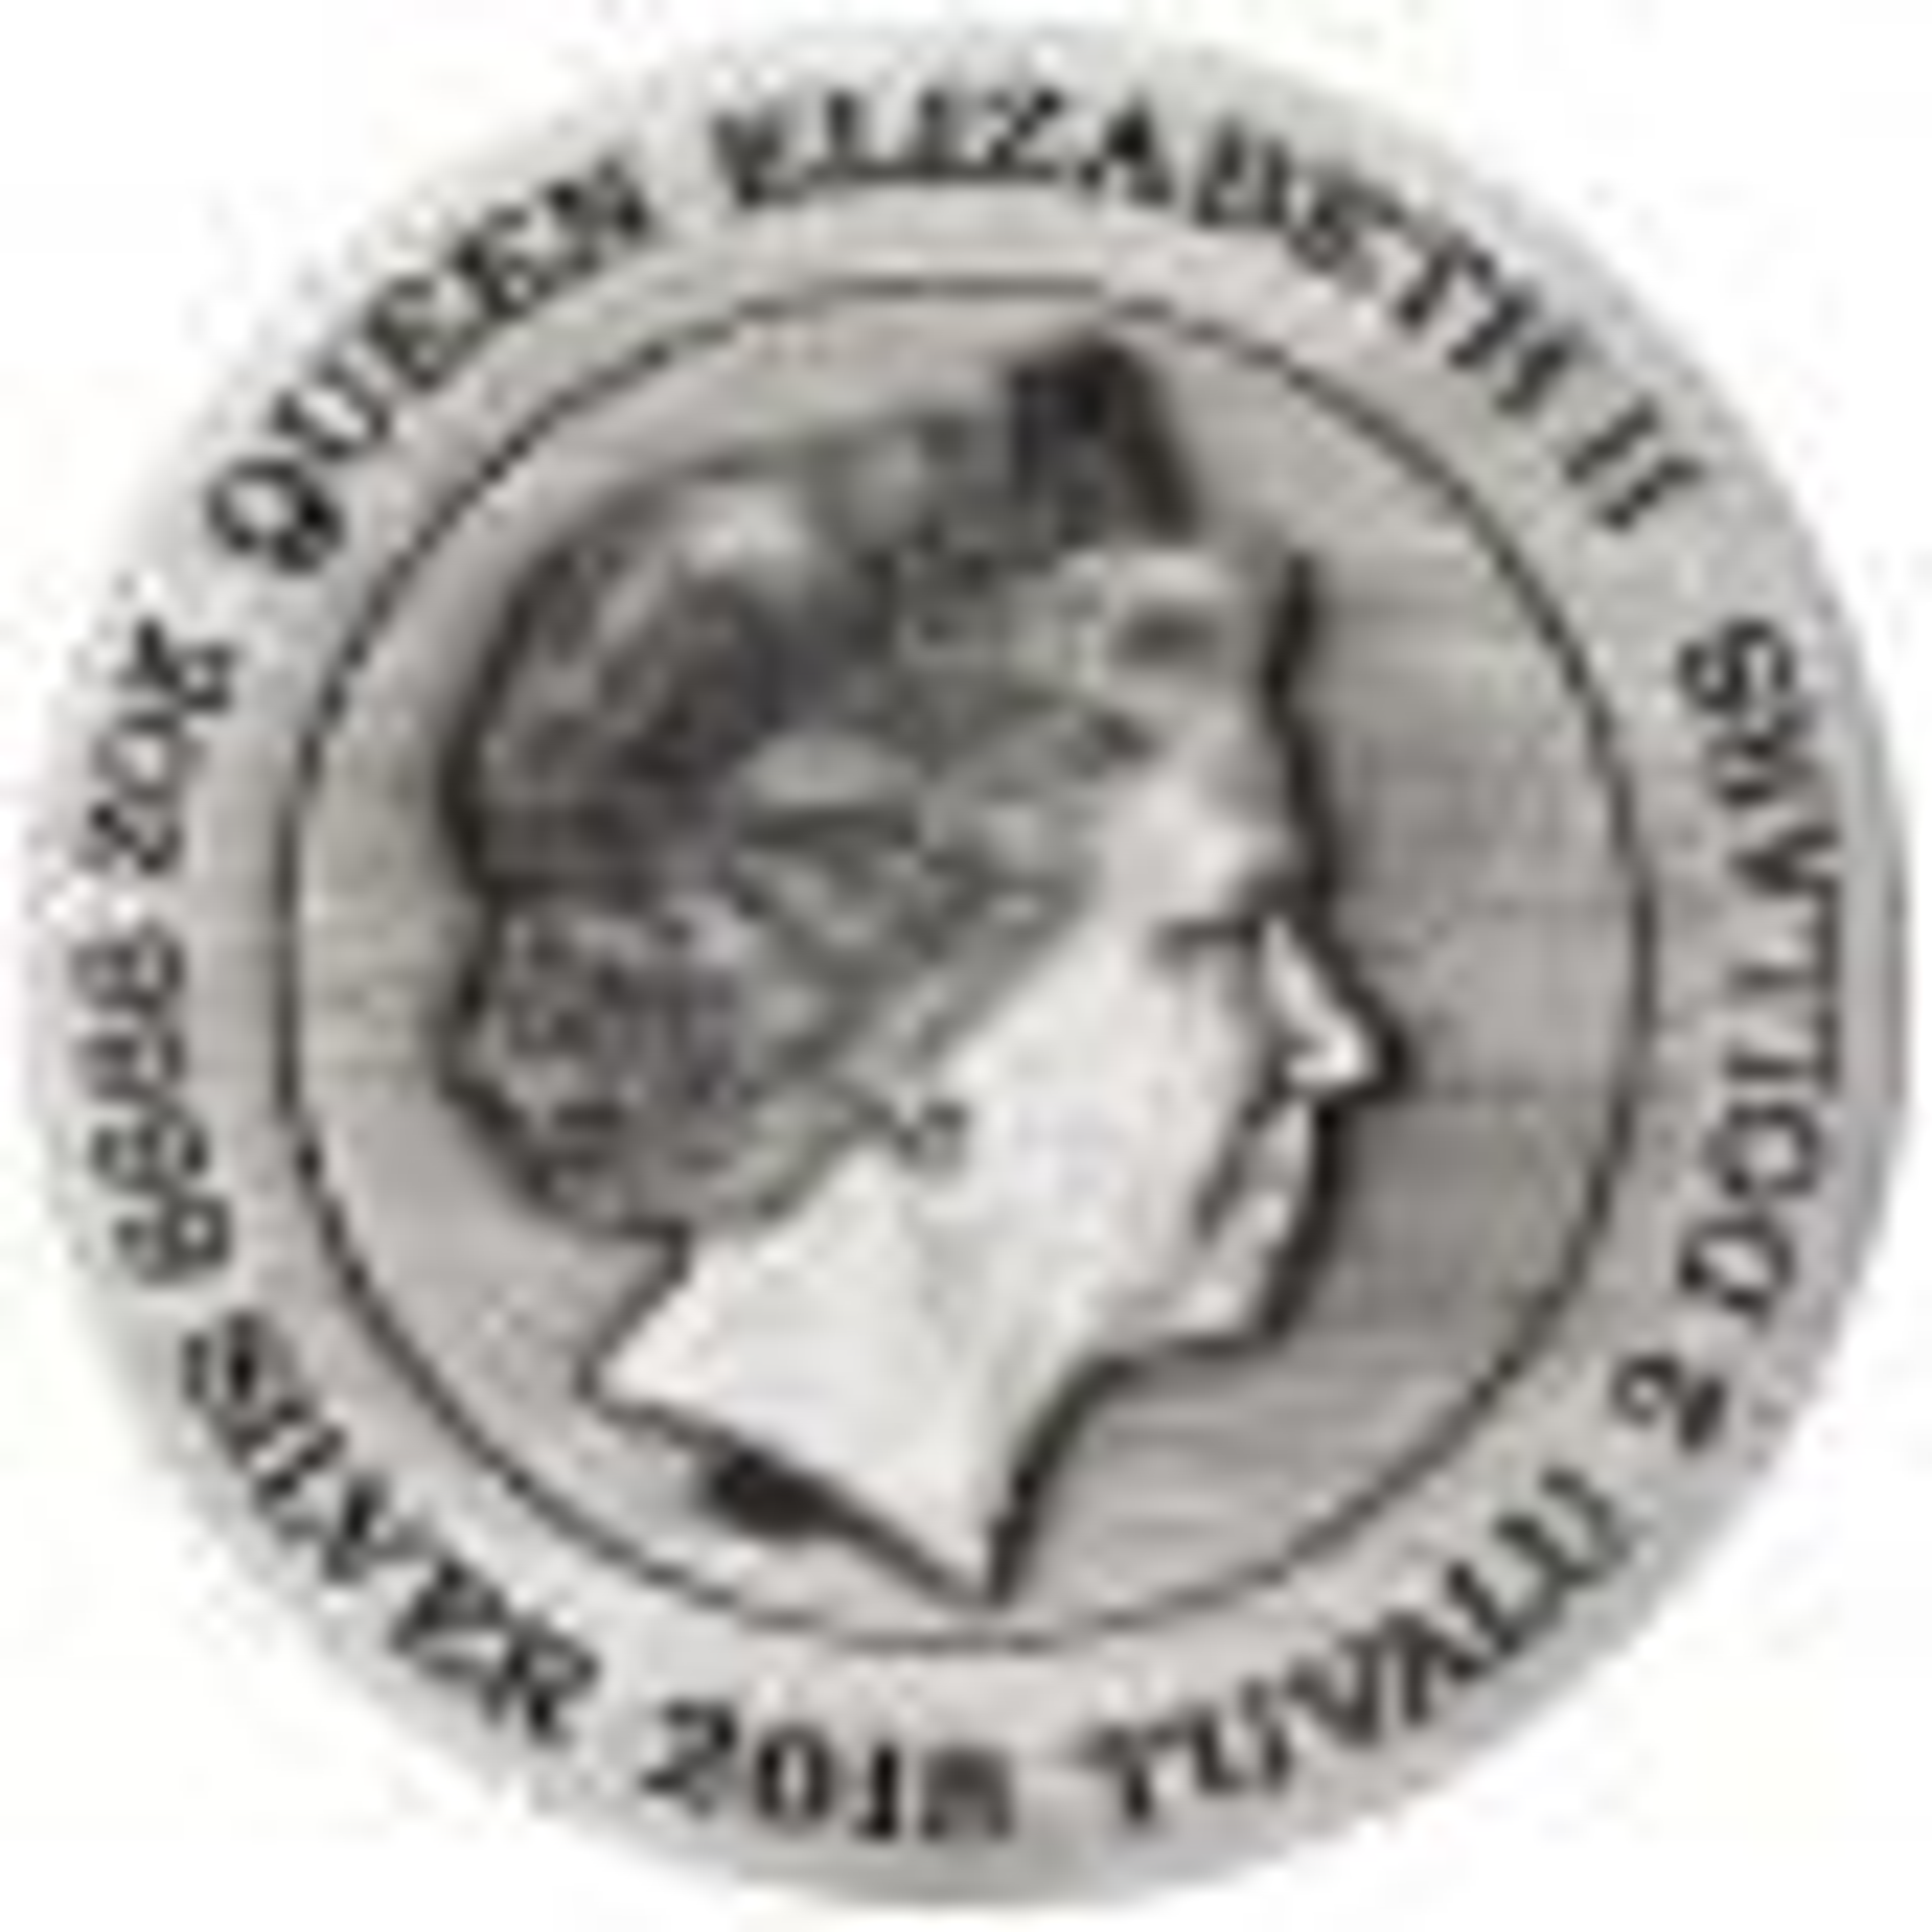 2 troy ounce zilveren munt Qi Lin Unicorn antieke afwerking 2018 - achterkant